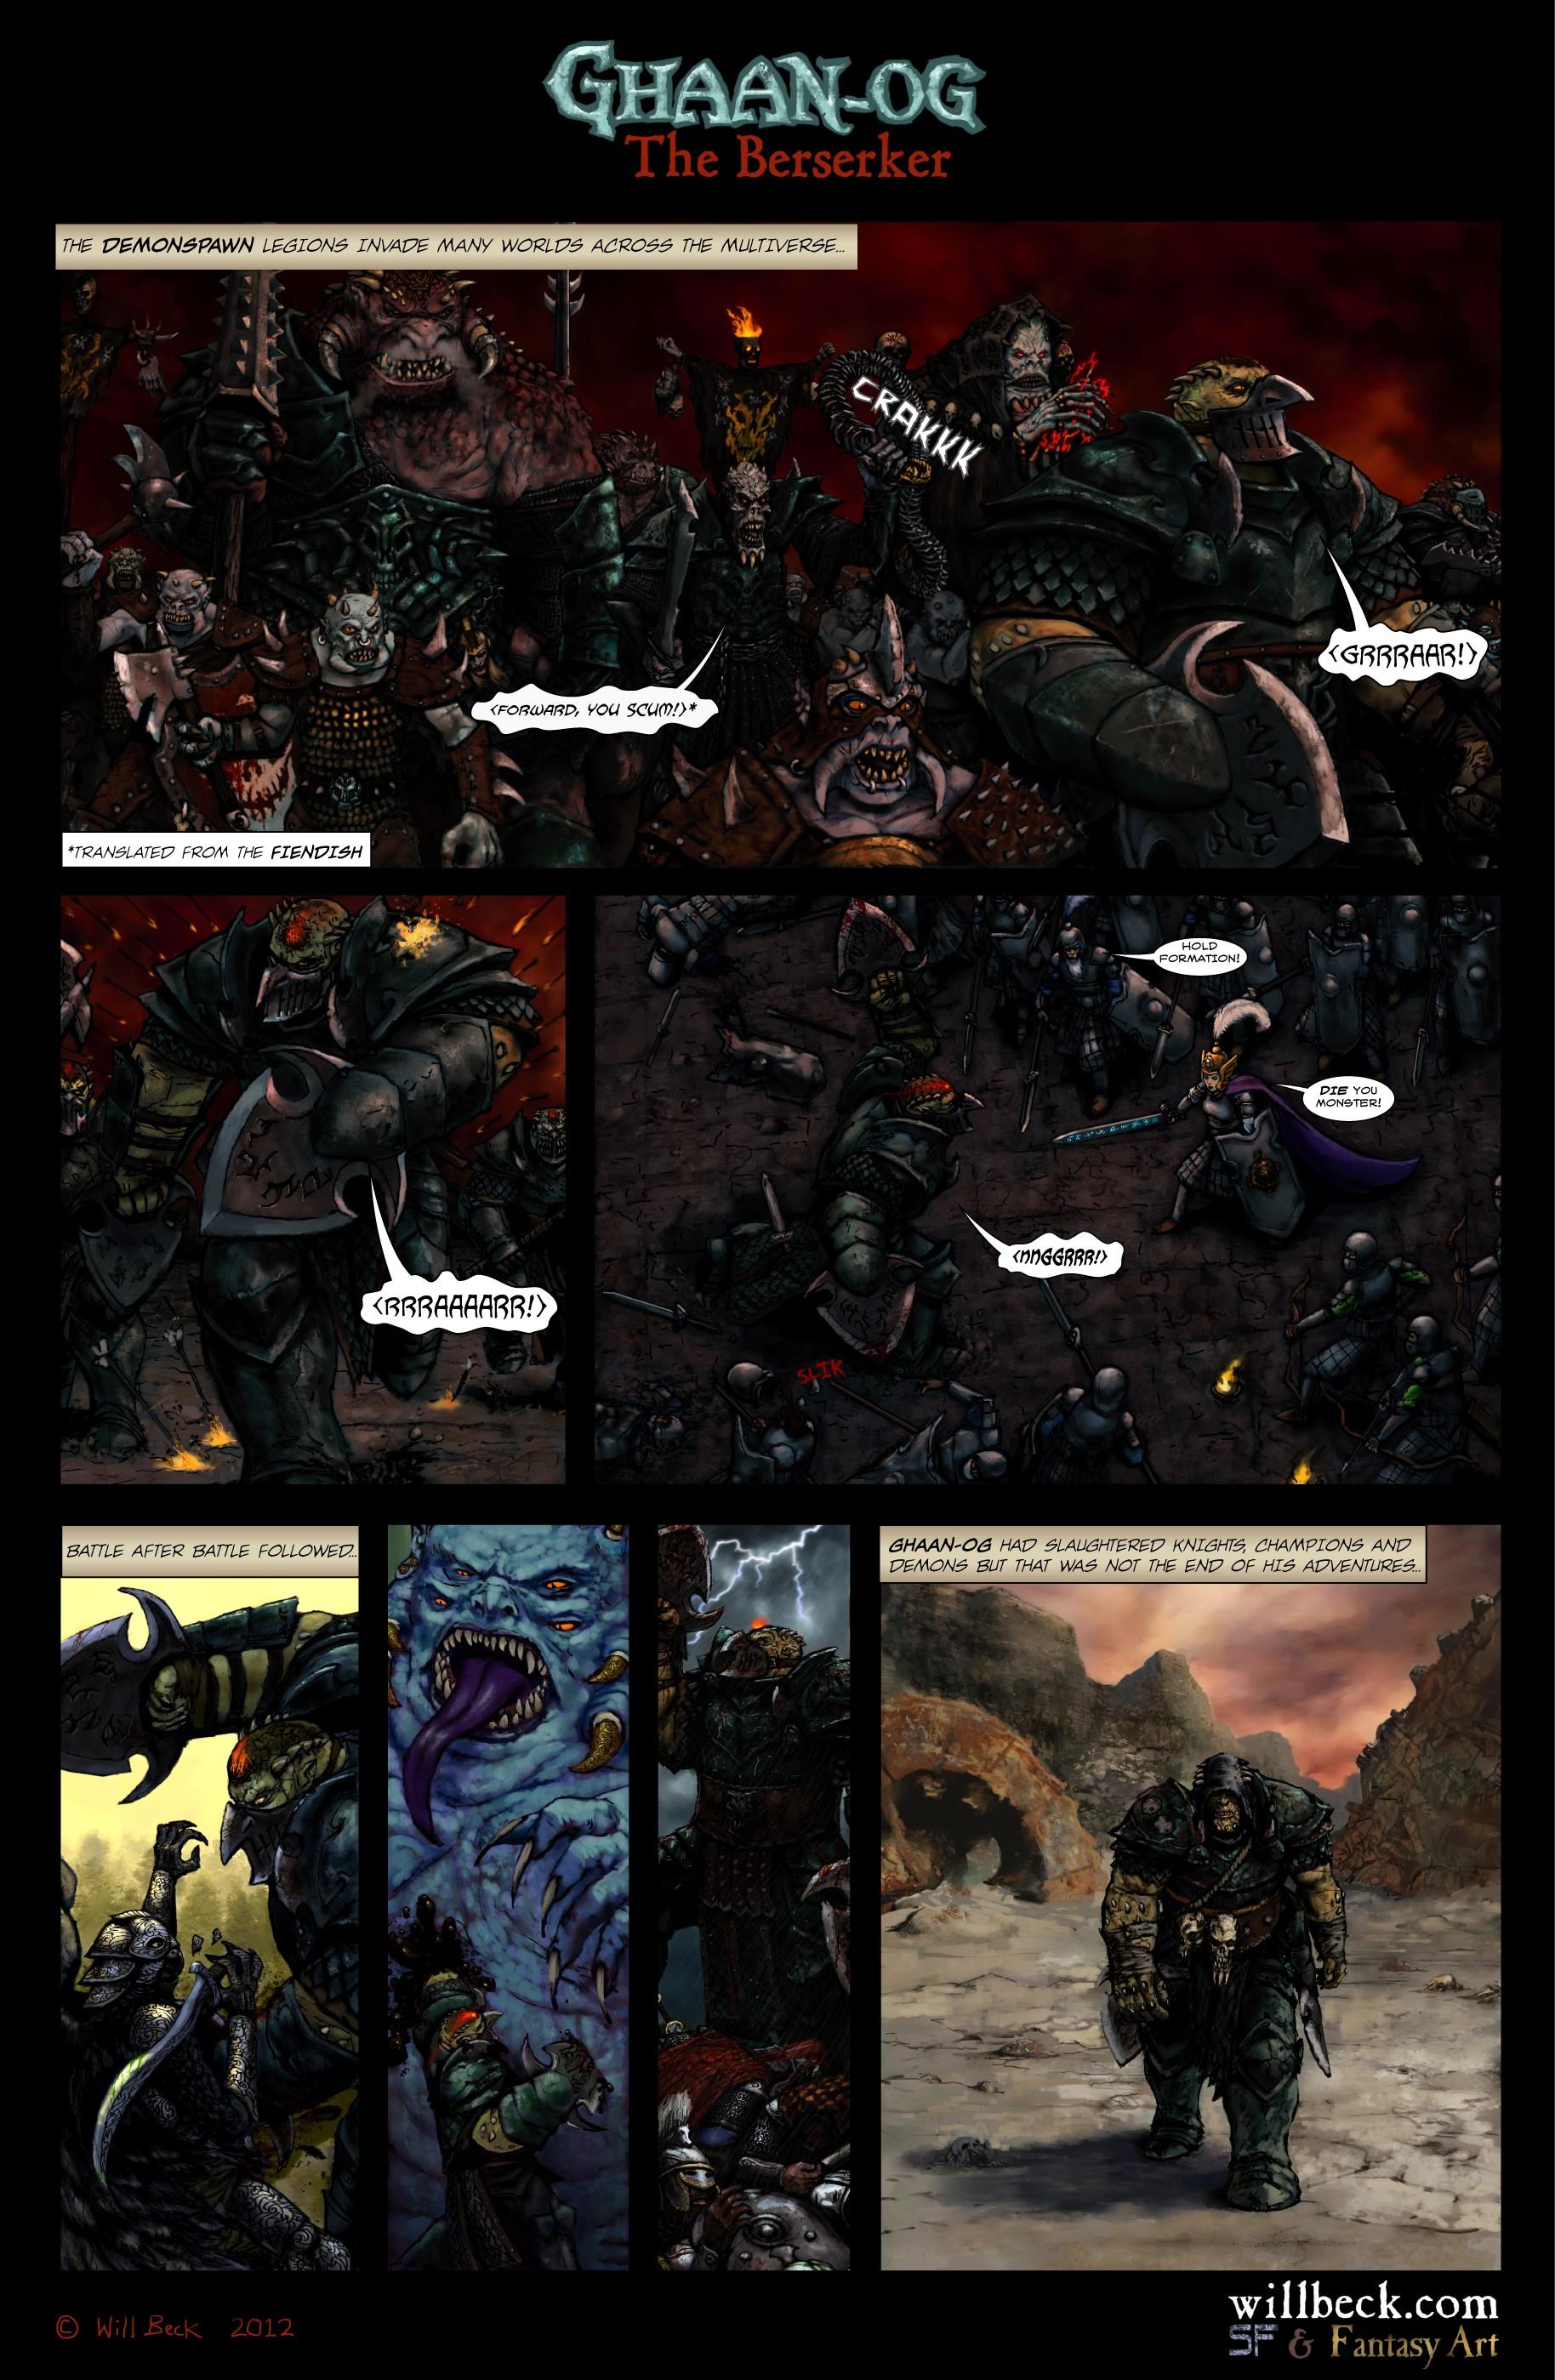 Ghaan-og The Berserker